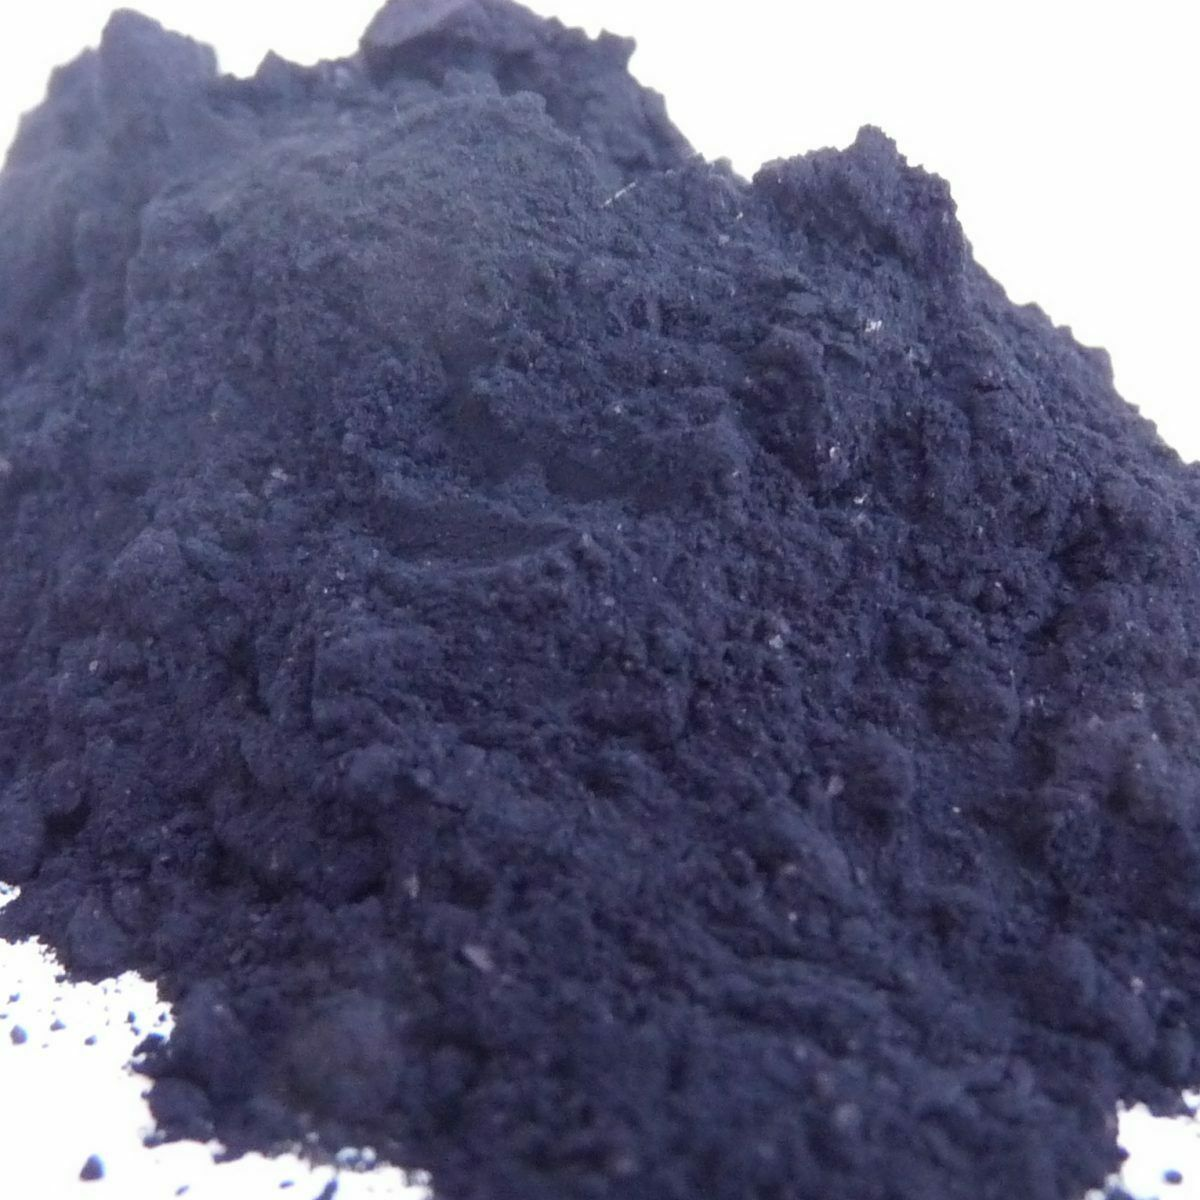 Carmin d'Indigo Indigotine E132 poudre Farbeant alimentaire hydrosoluble - 500 g